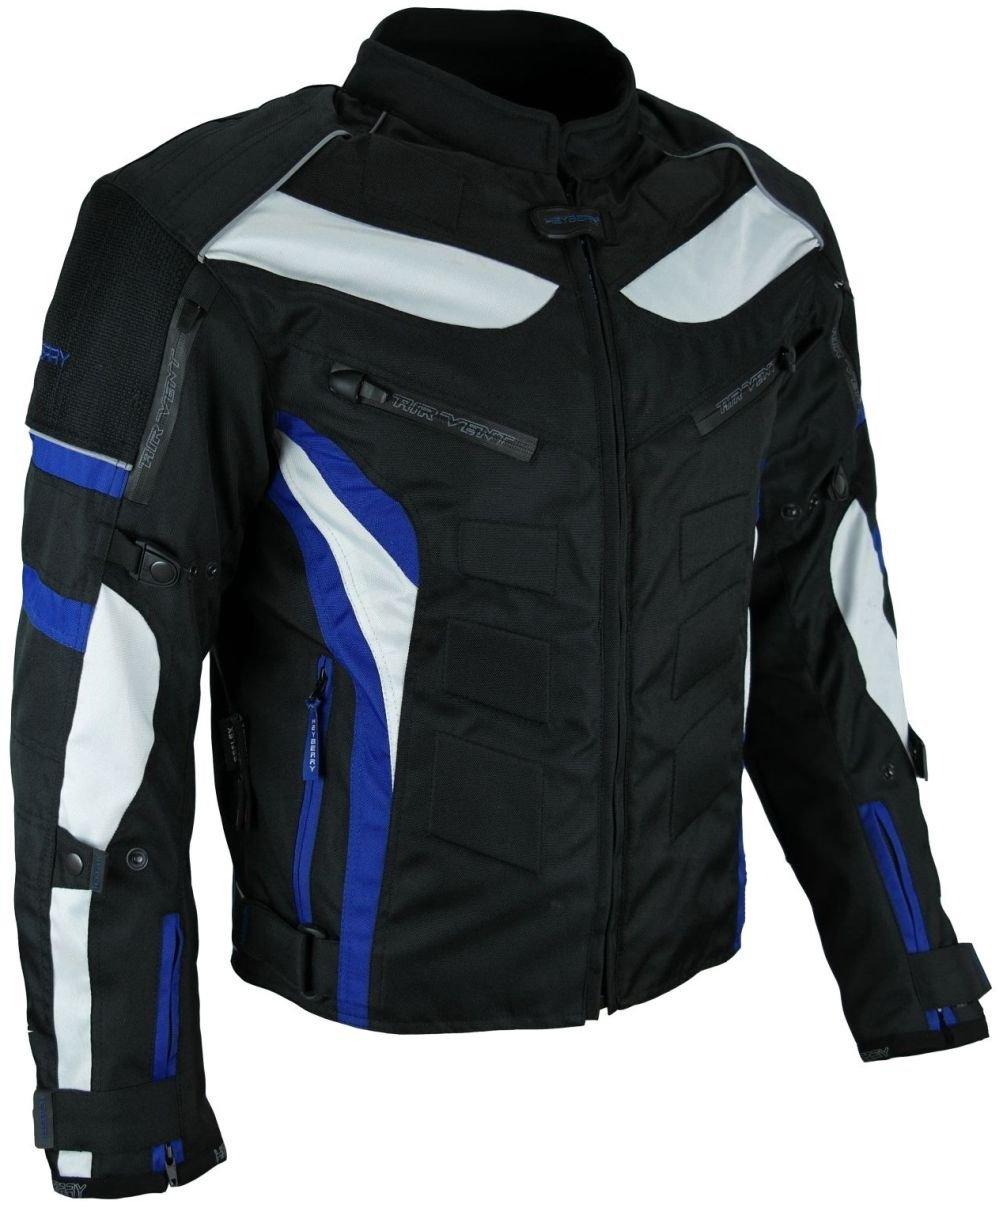 Heyberry Textil Motorrad Jacke Motorradjacke Schwarz Blau Gr. M 20007